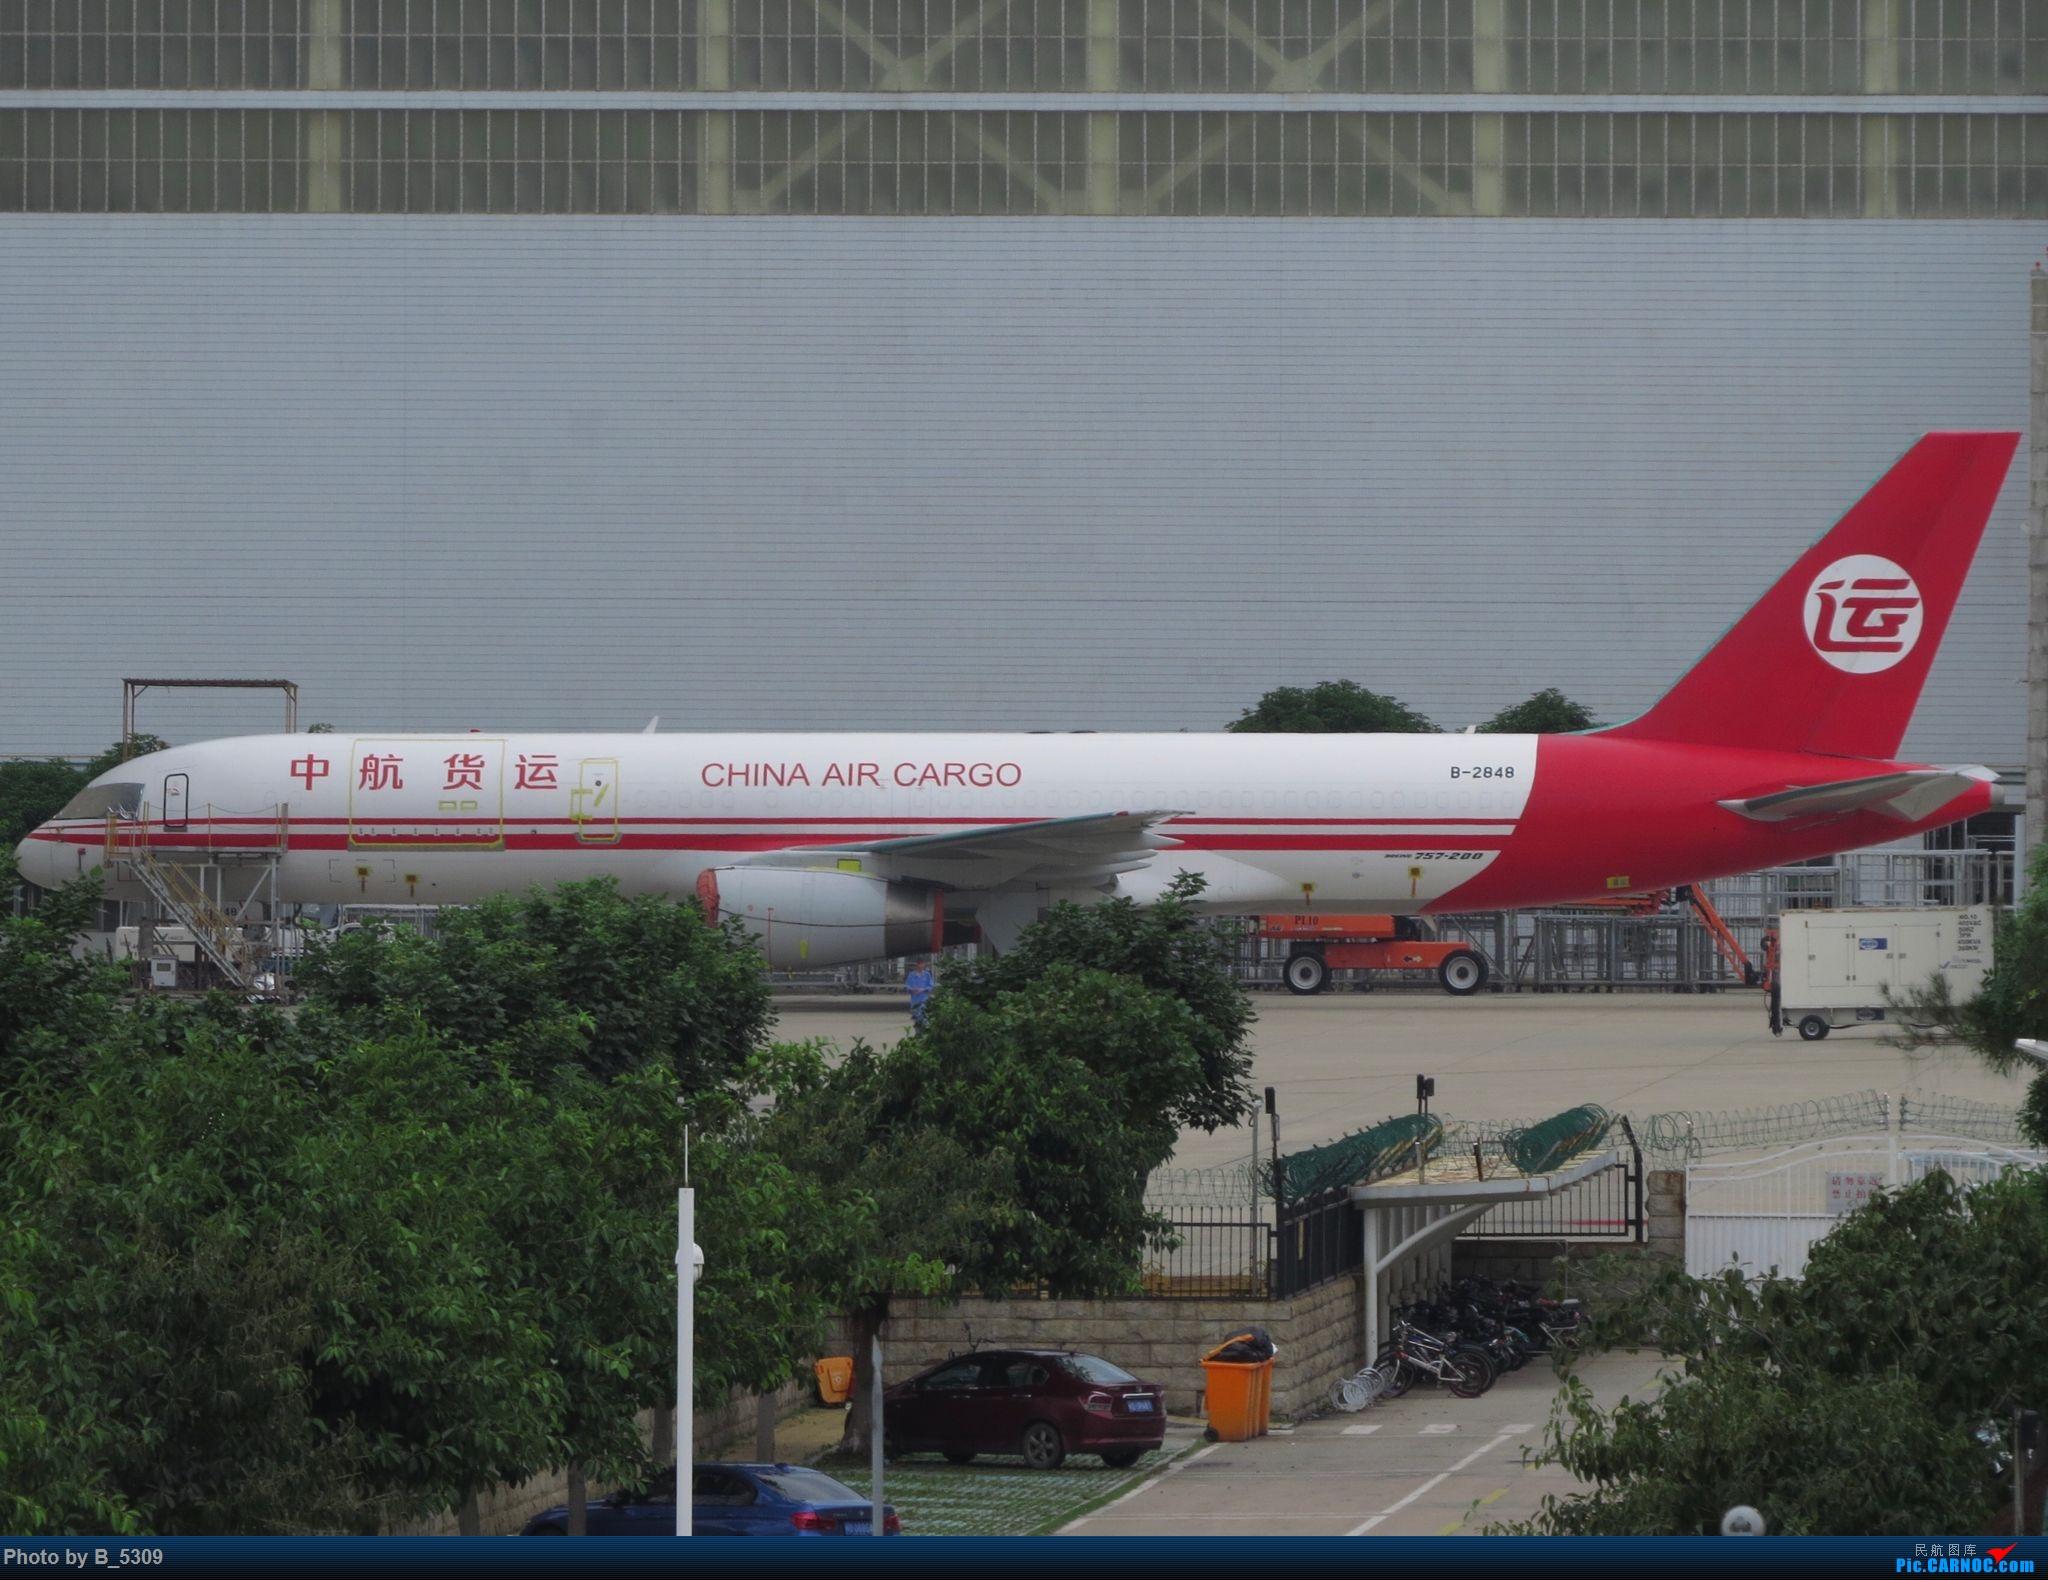 Re:[原创]复课一个月了,终于能在紧张的学习生活中抽出点时间拍稽~ BOEING 757-200 B-2848 中国厦门高崎国际机场